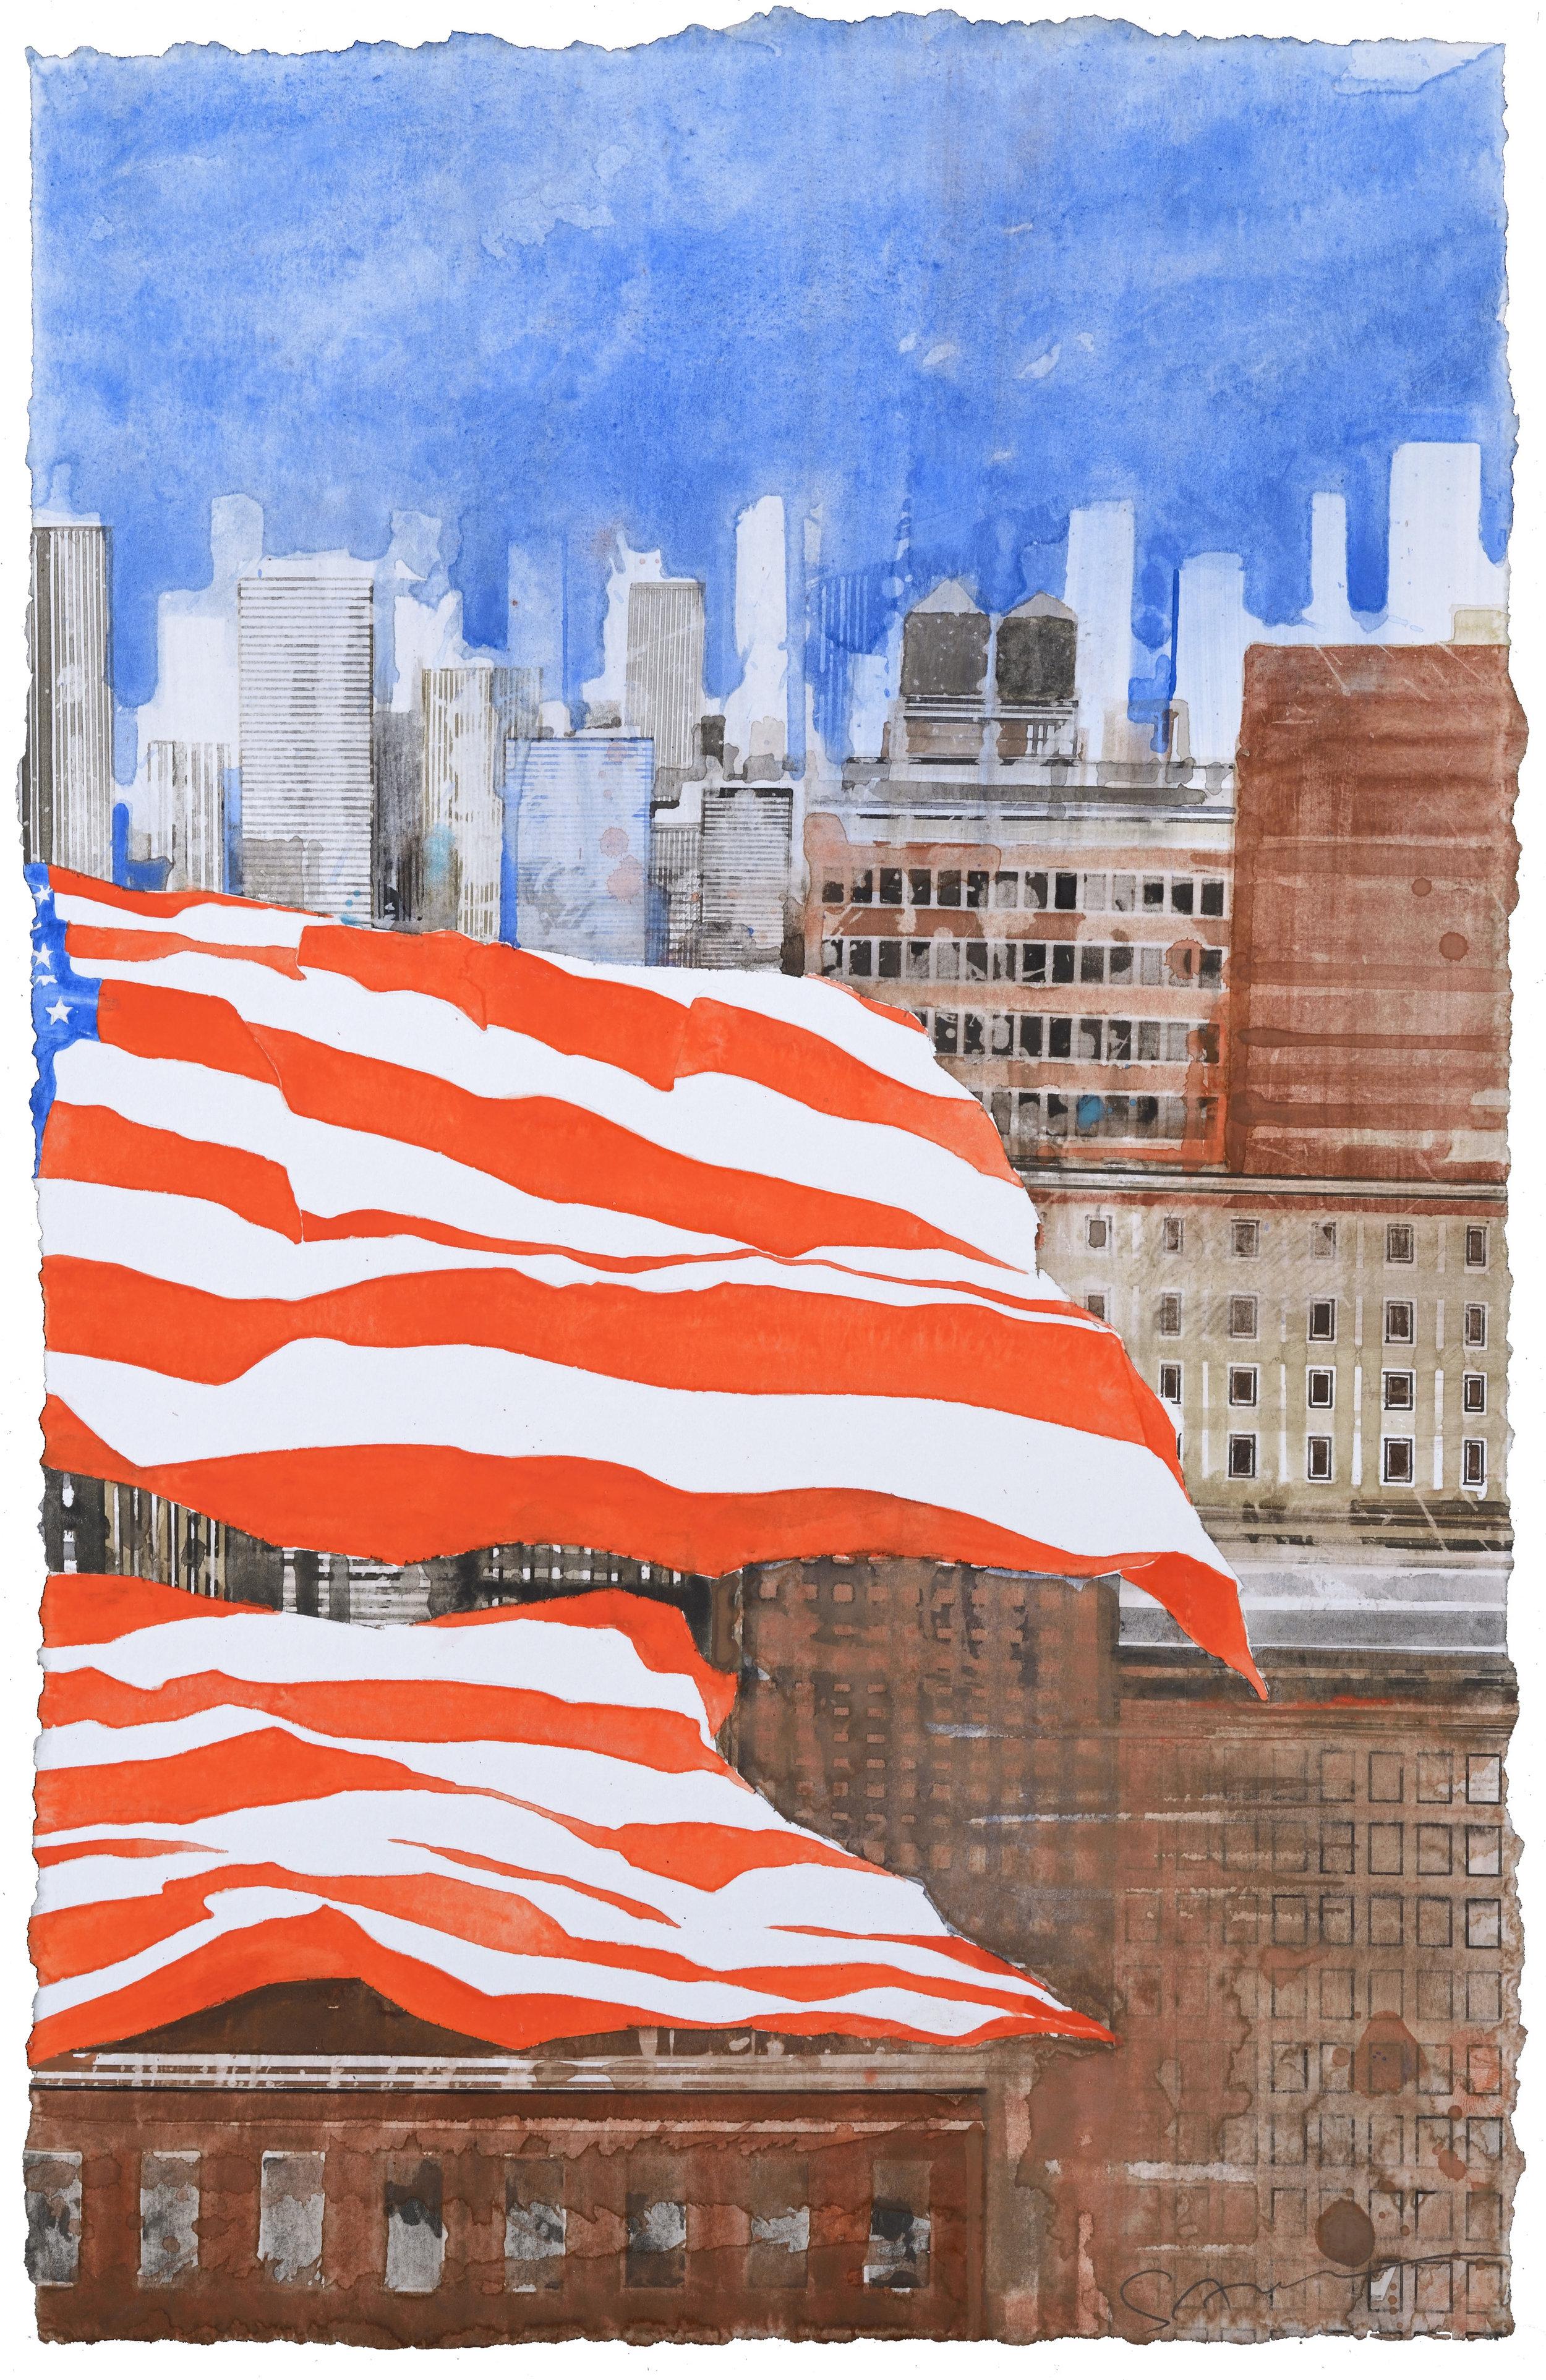 US Flag IX, watercolor, 48 x 30 cm, 19 x 12 in, 2016